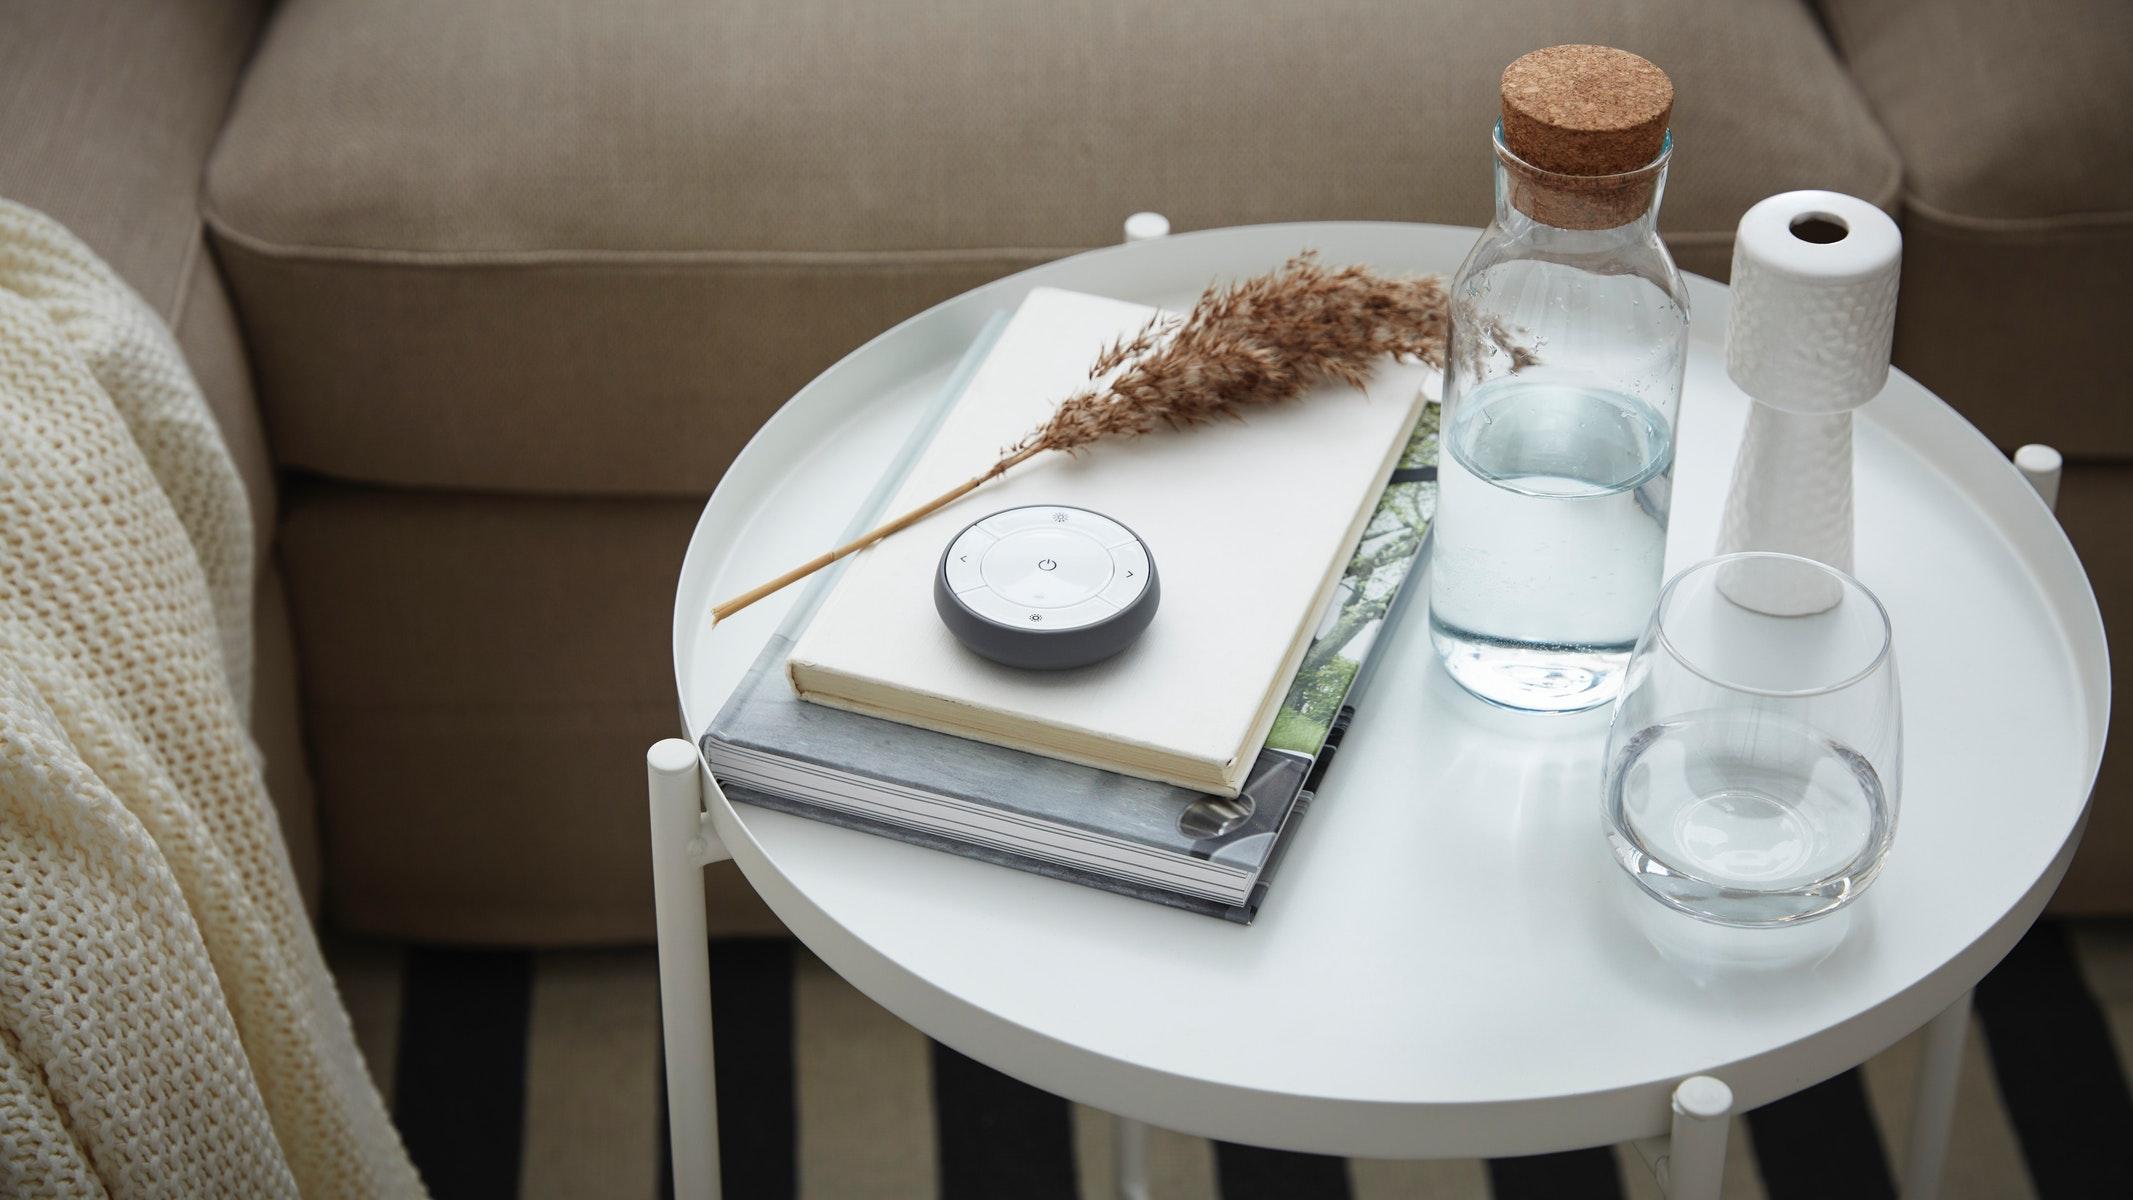 meja tamu dengan baki